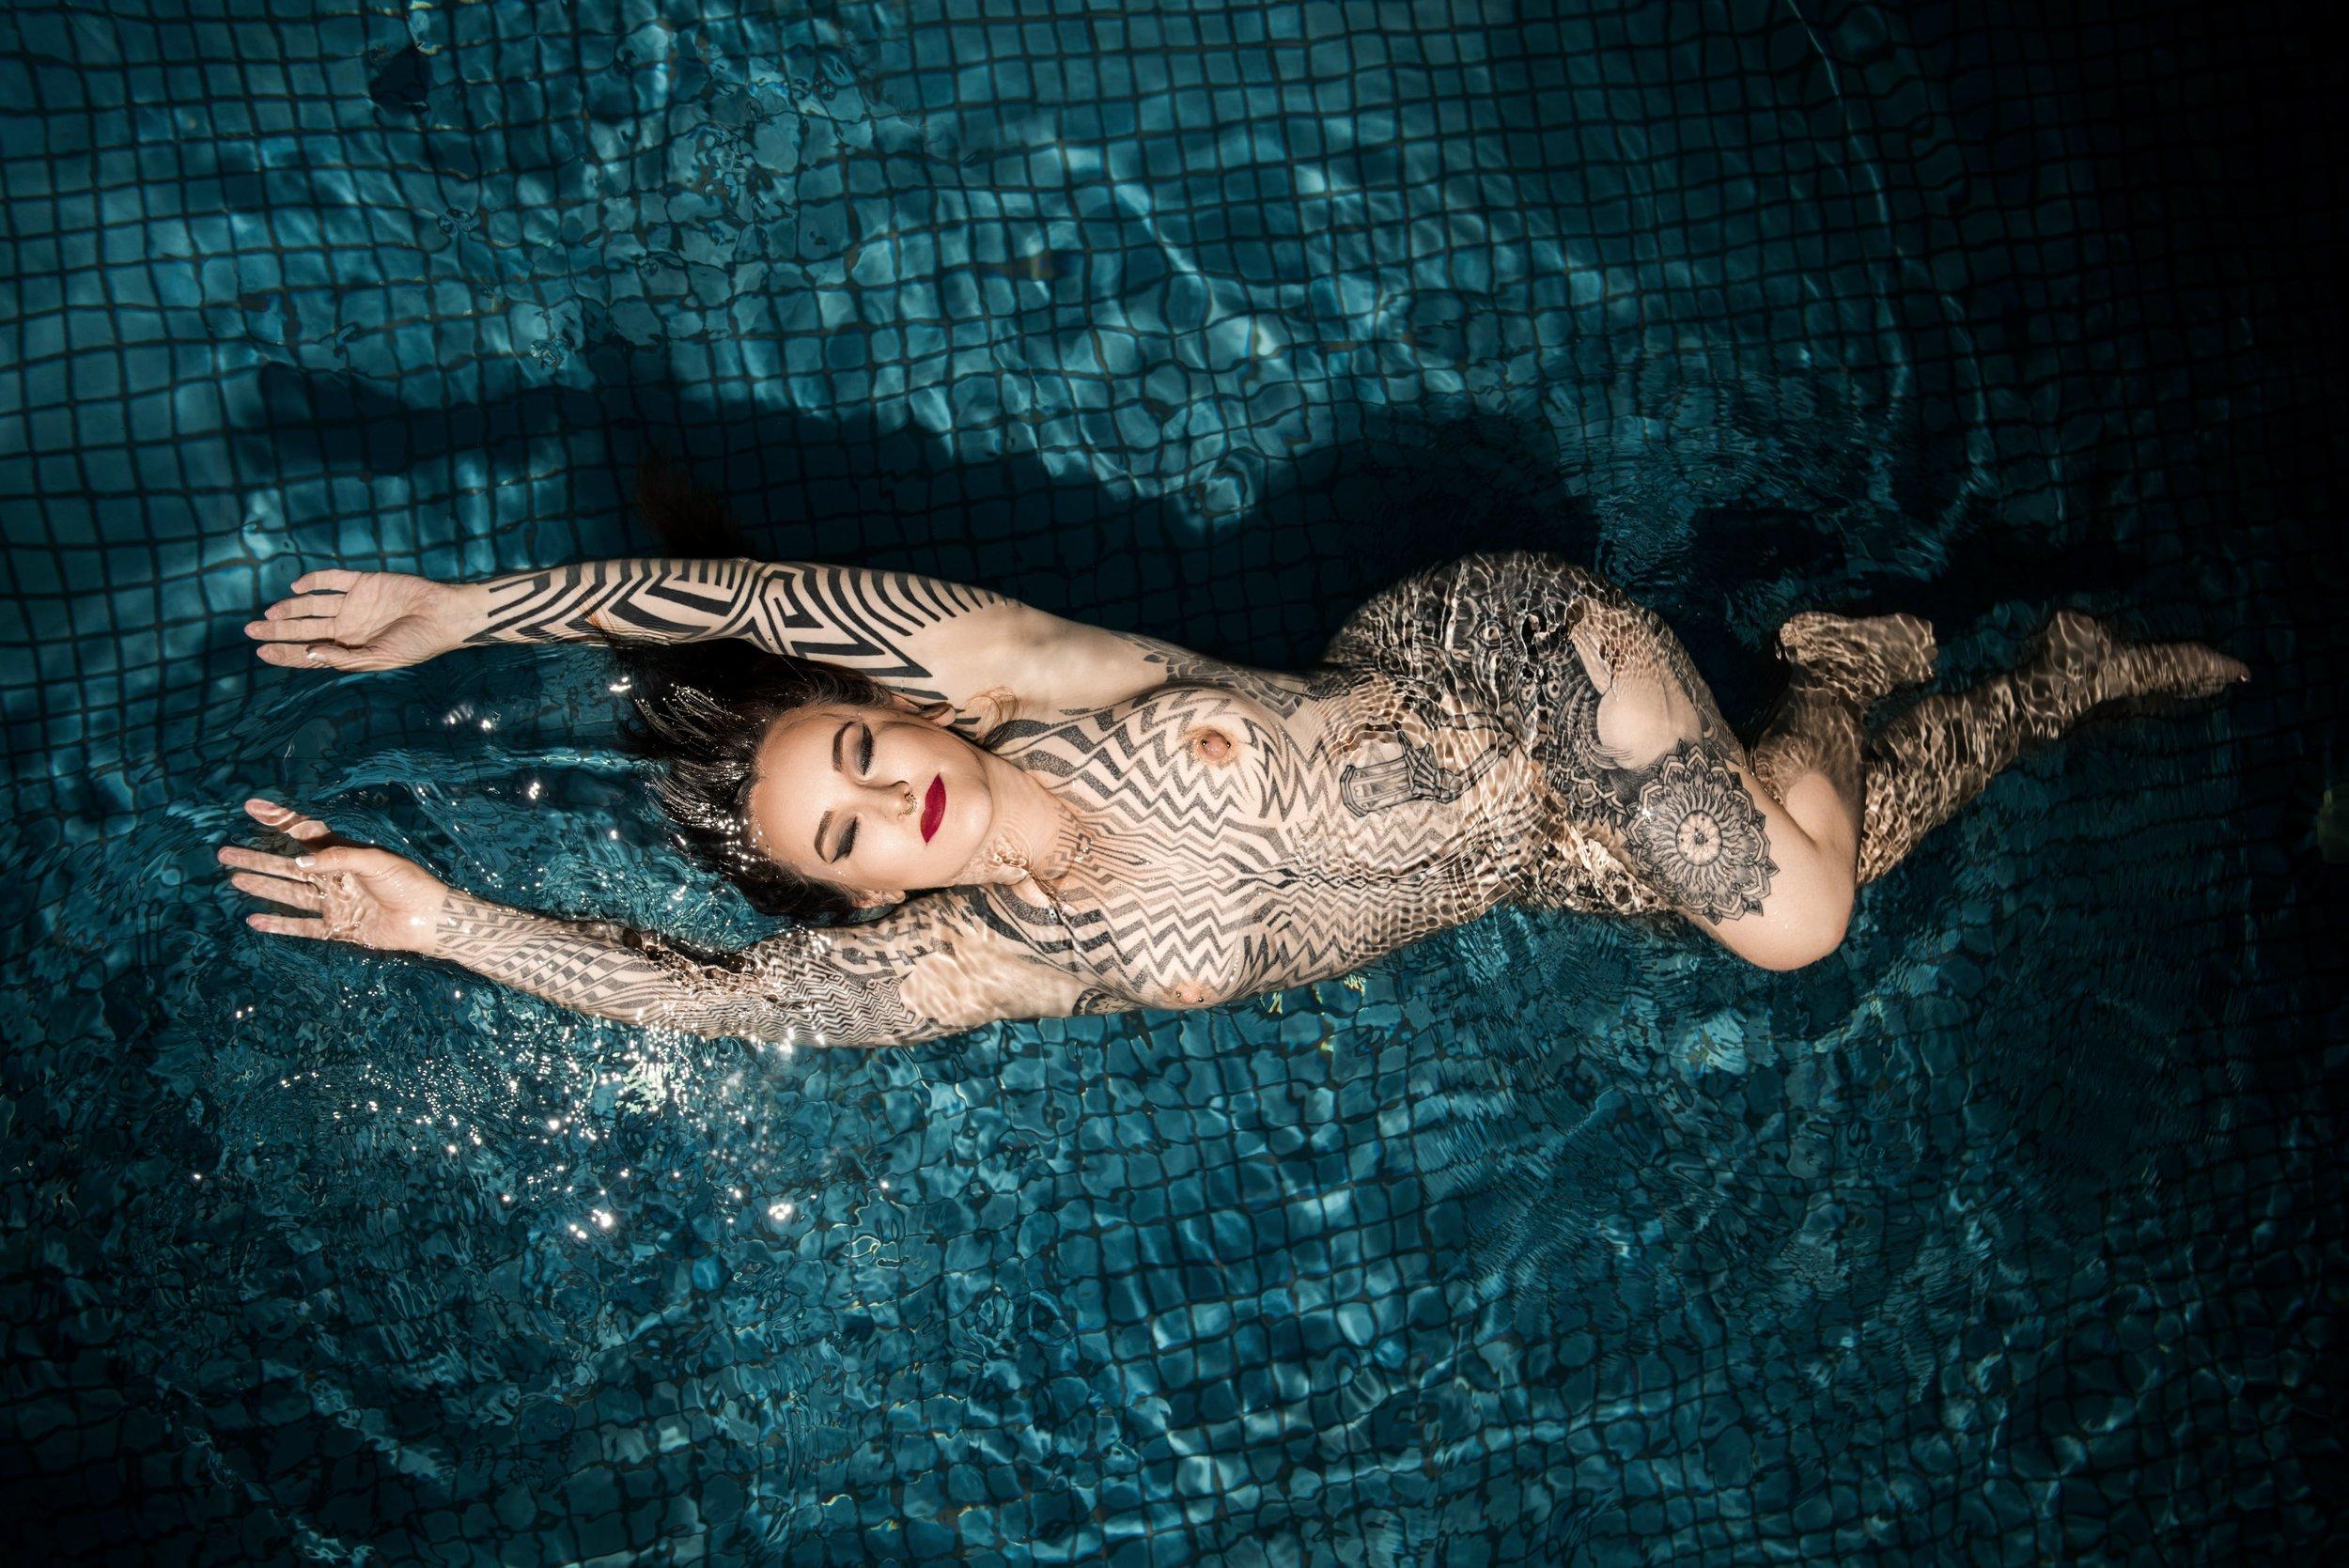 Tallula darling, exclusive arrangements, fly me to you, tattooed escort, alternative escort, suicide girl escort, luxury gfe